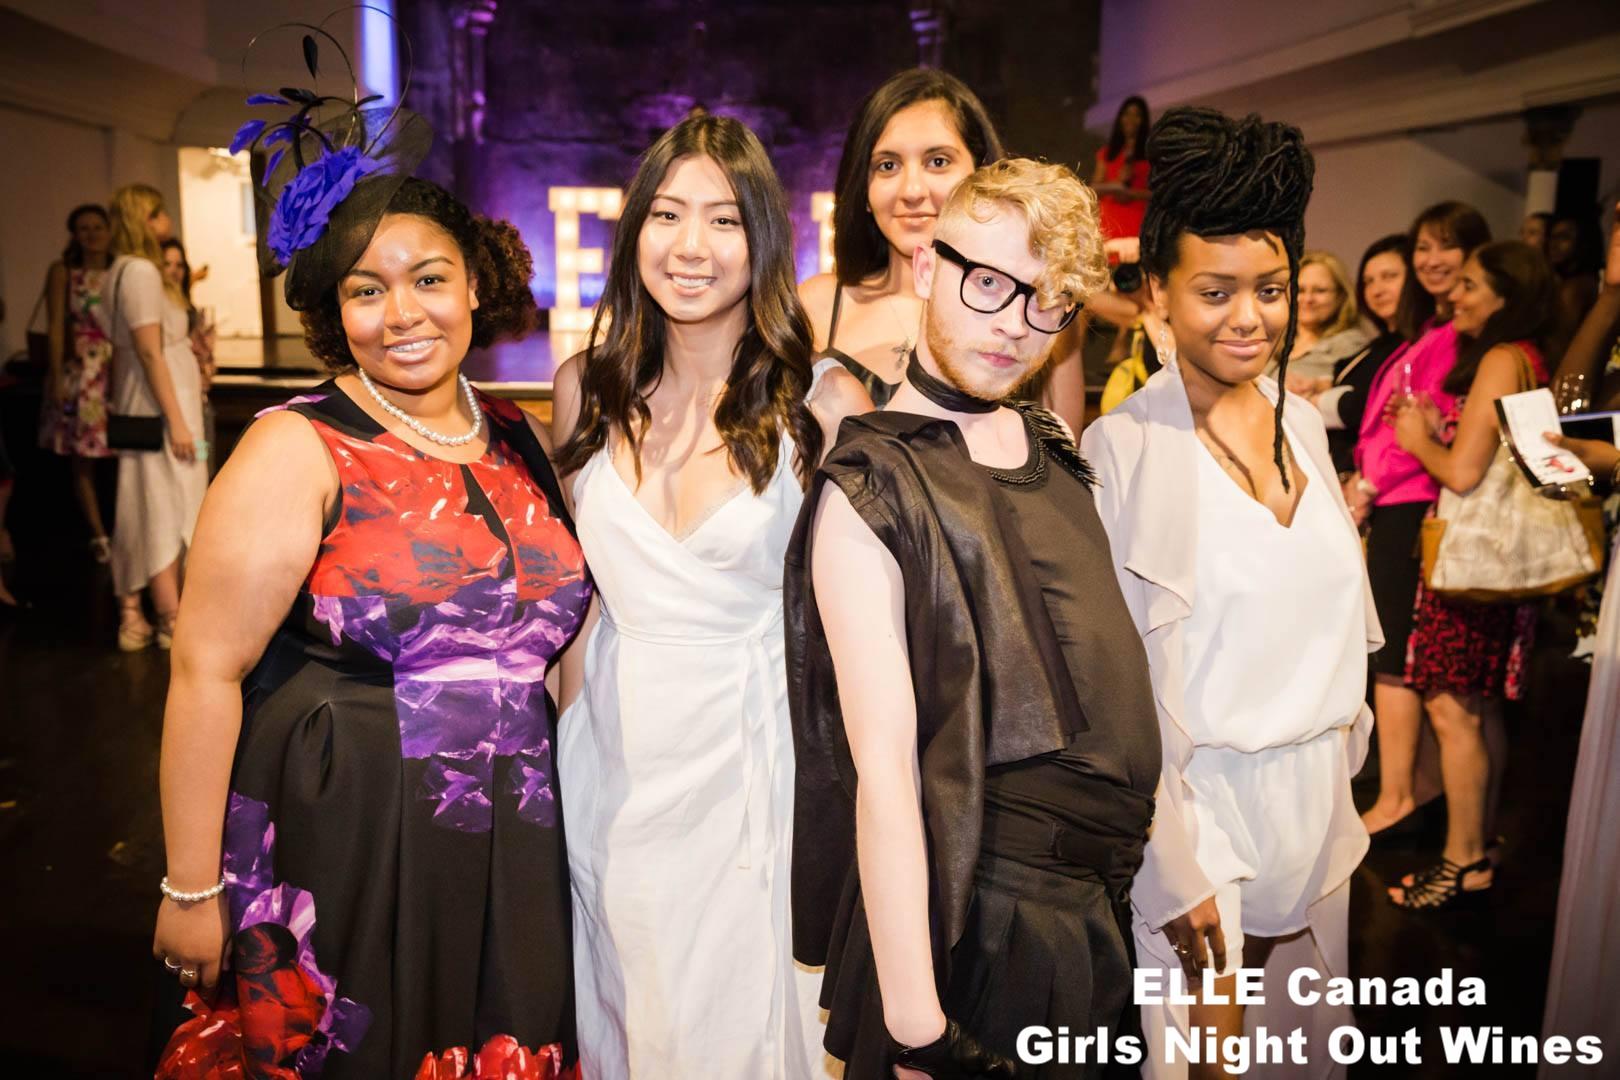 Girls Night Out Wines 2016 6.jpg